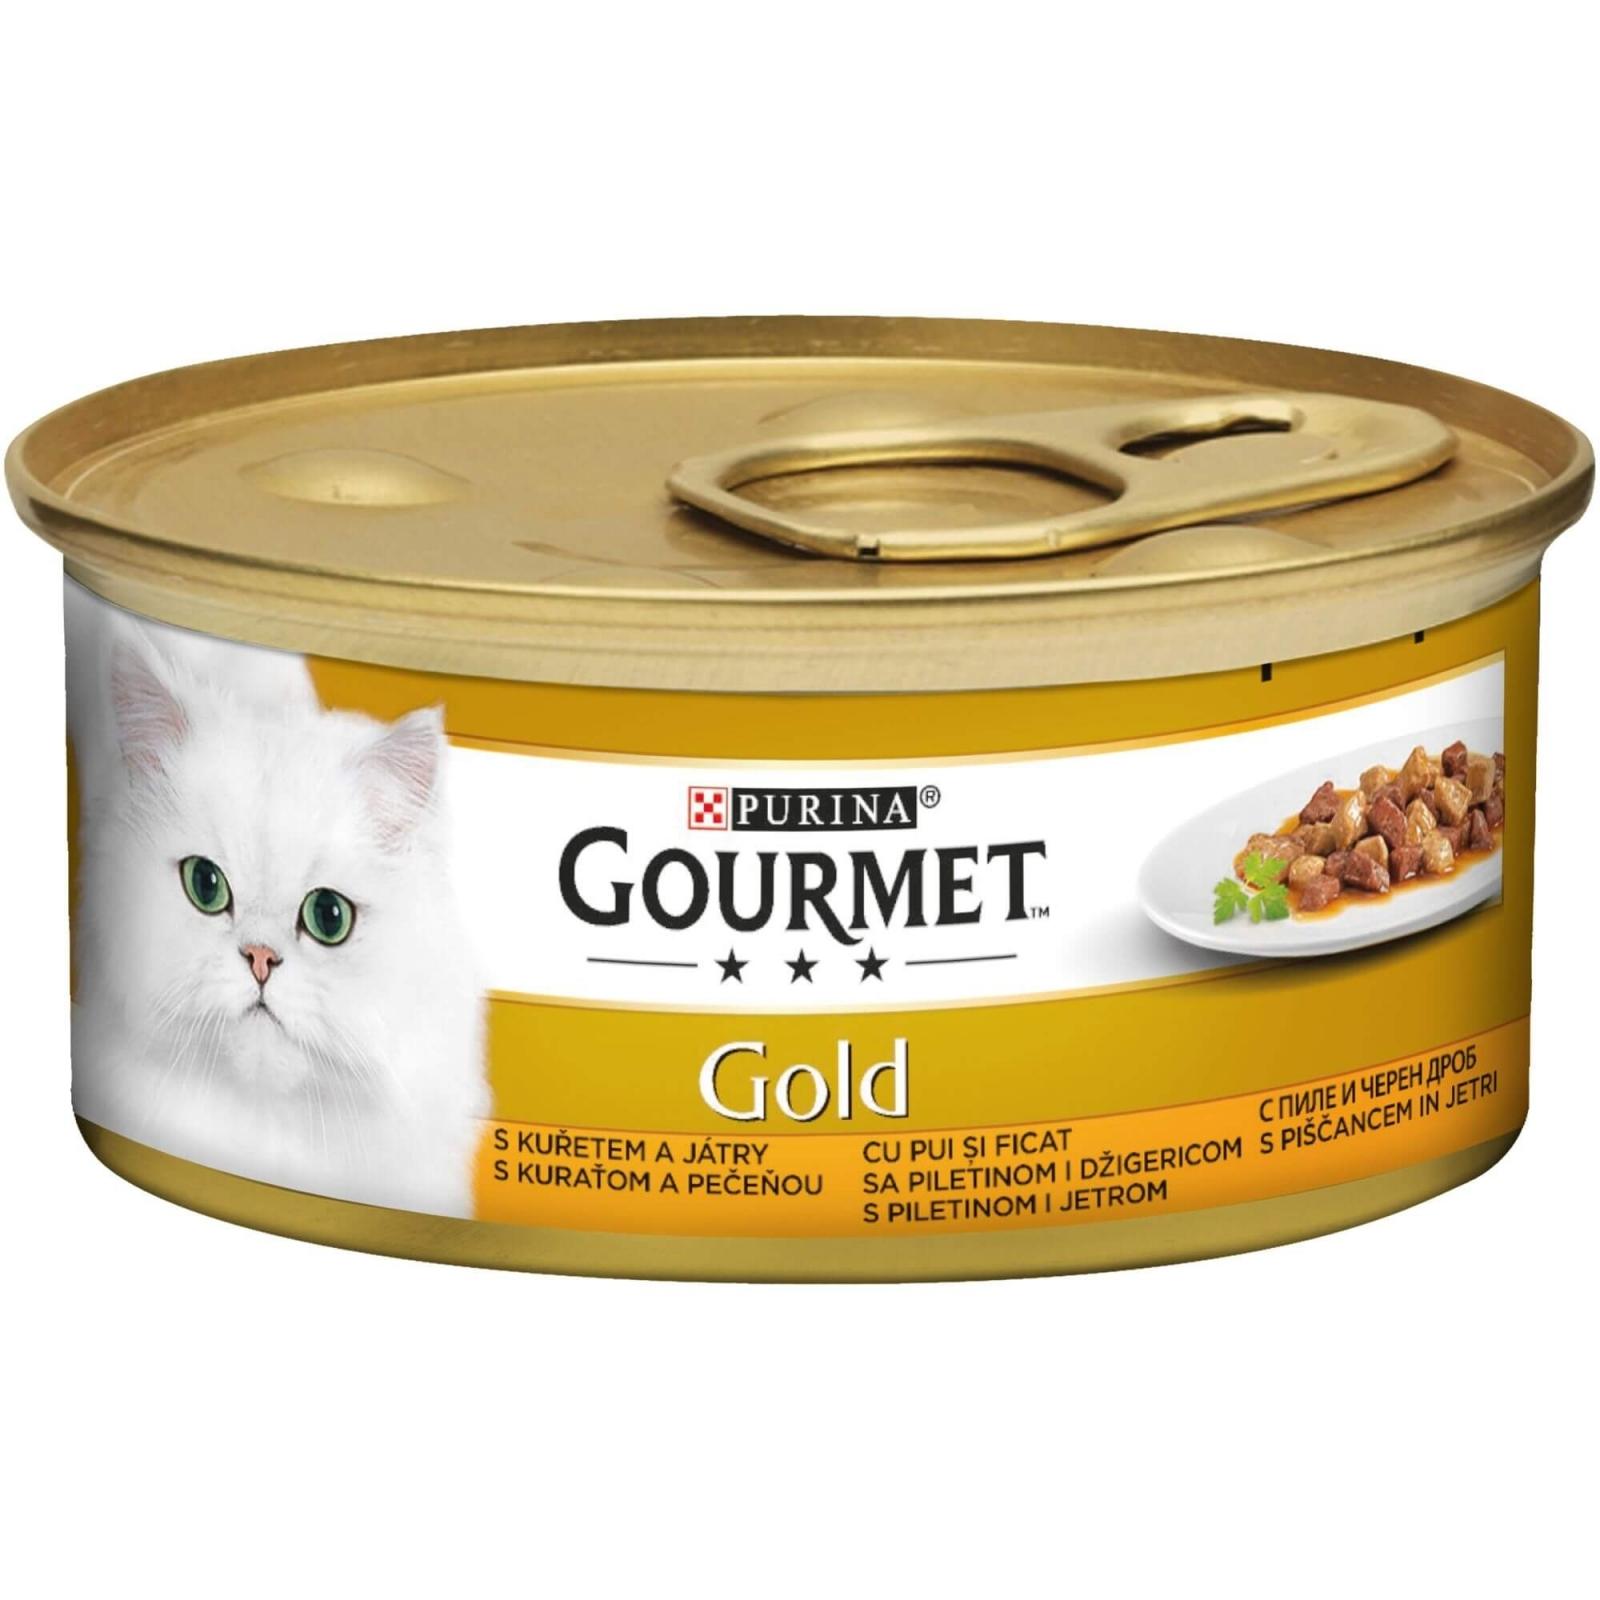 Gourmet Gold Bucatele de Carne in Sos, Pui si Ficat, 85 g imagine